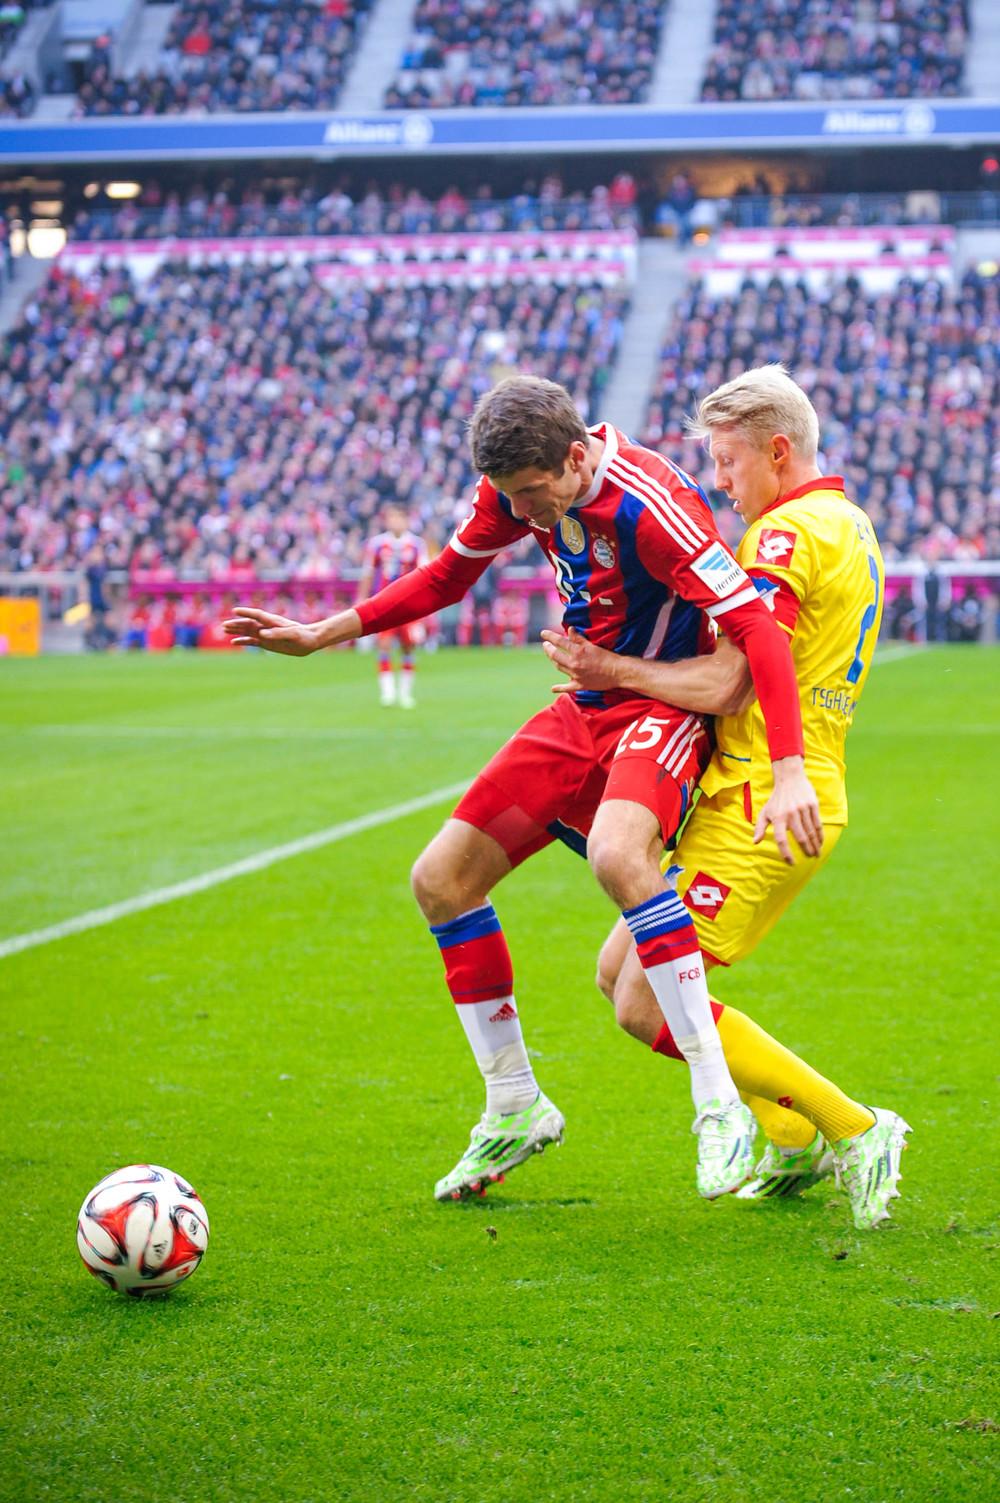 Stadion_FCB_vs_TSGH_22.11.2014_web-23.jpg